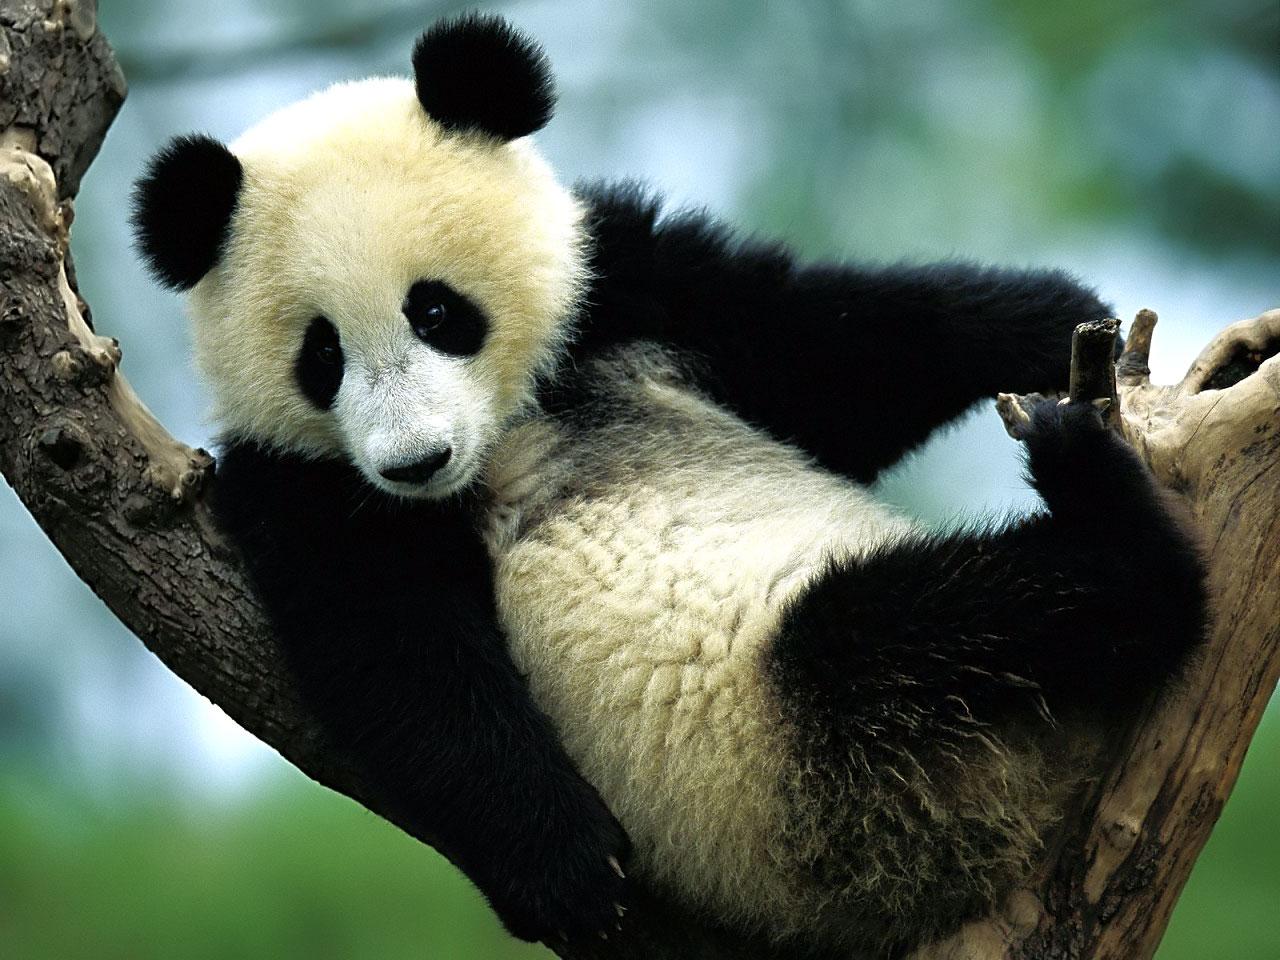 Tiger Iphone 6 Wallpaper Chinese Panda Wallpapers 171 Nat Geo Adventure